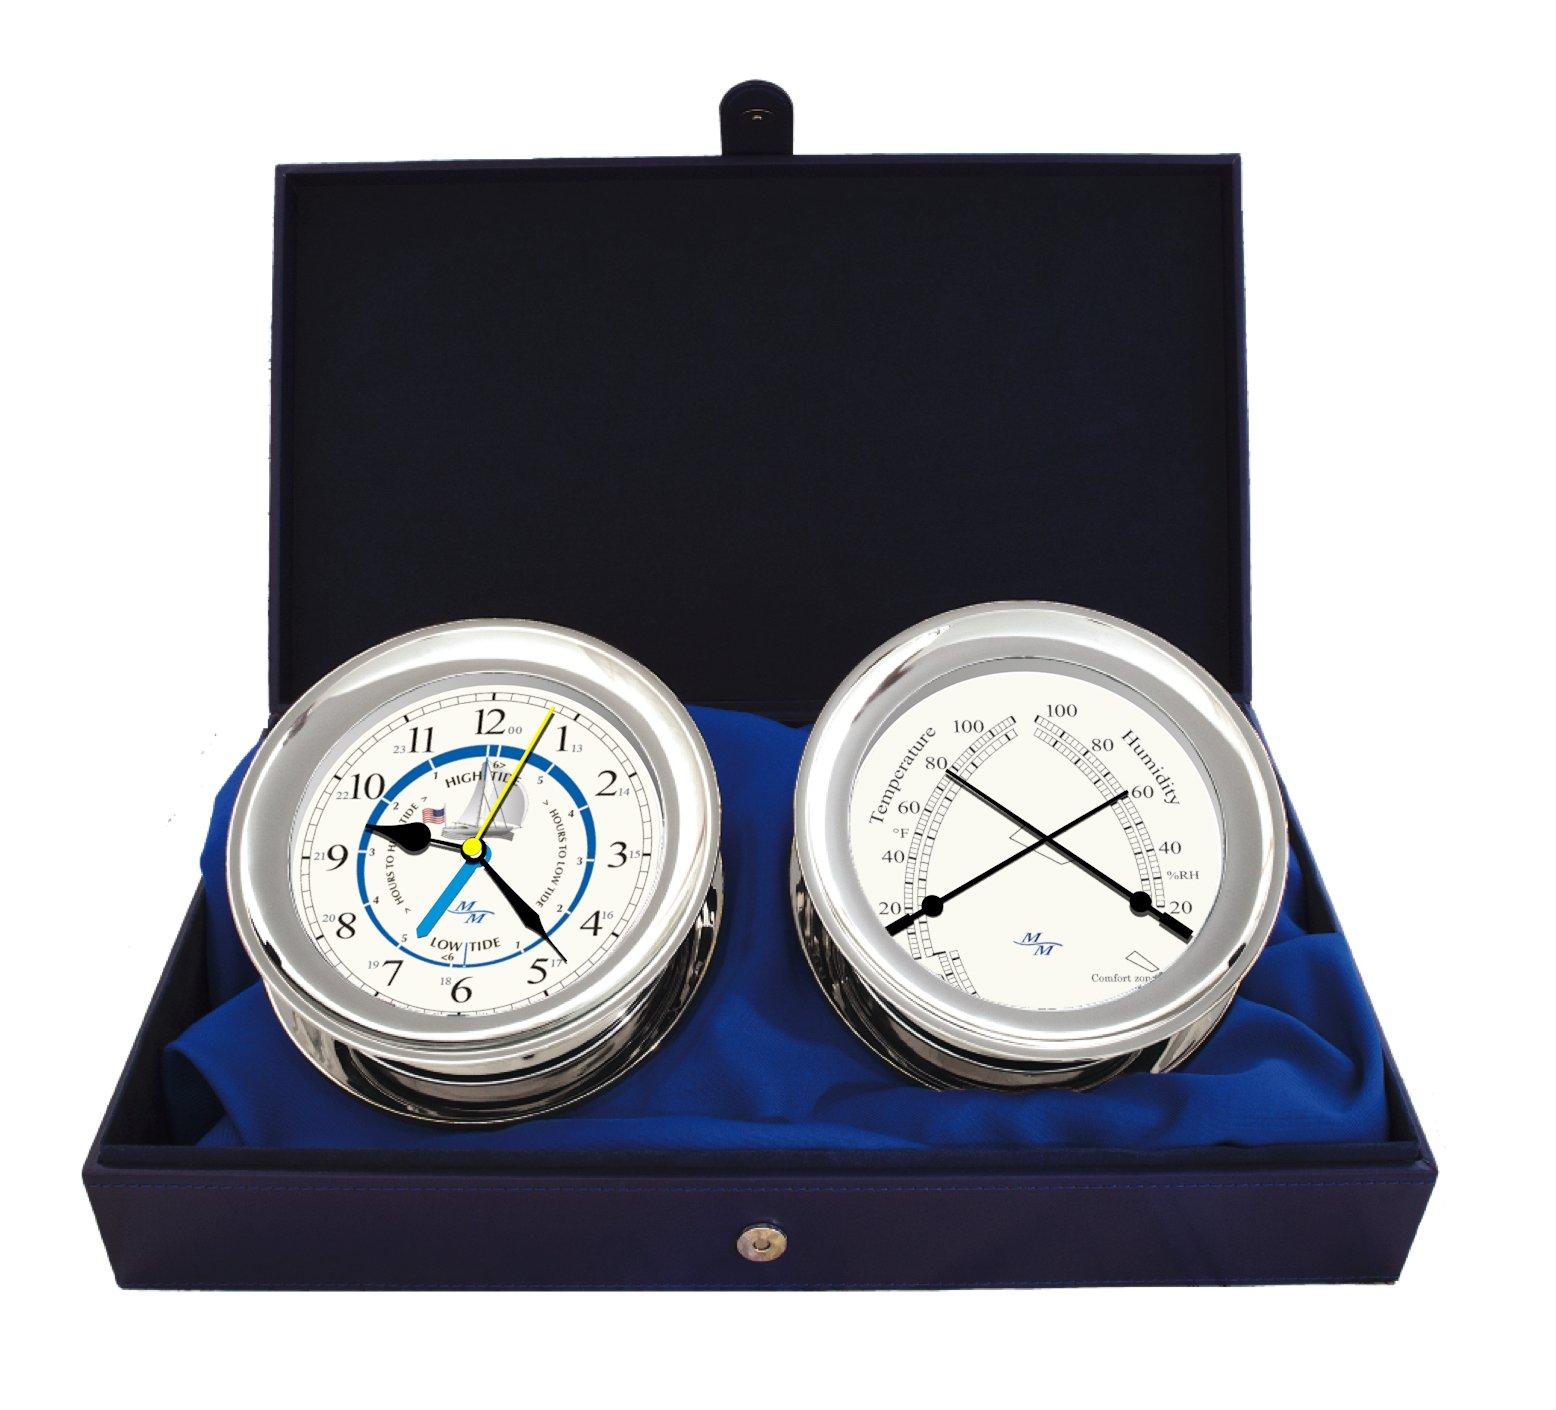 Windlass Gift Set Time & Tide Clock & Comfort Meter by Master-Mariner, Chrome finish, Ivory ship dial